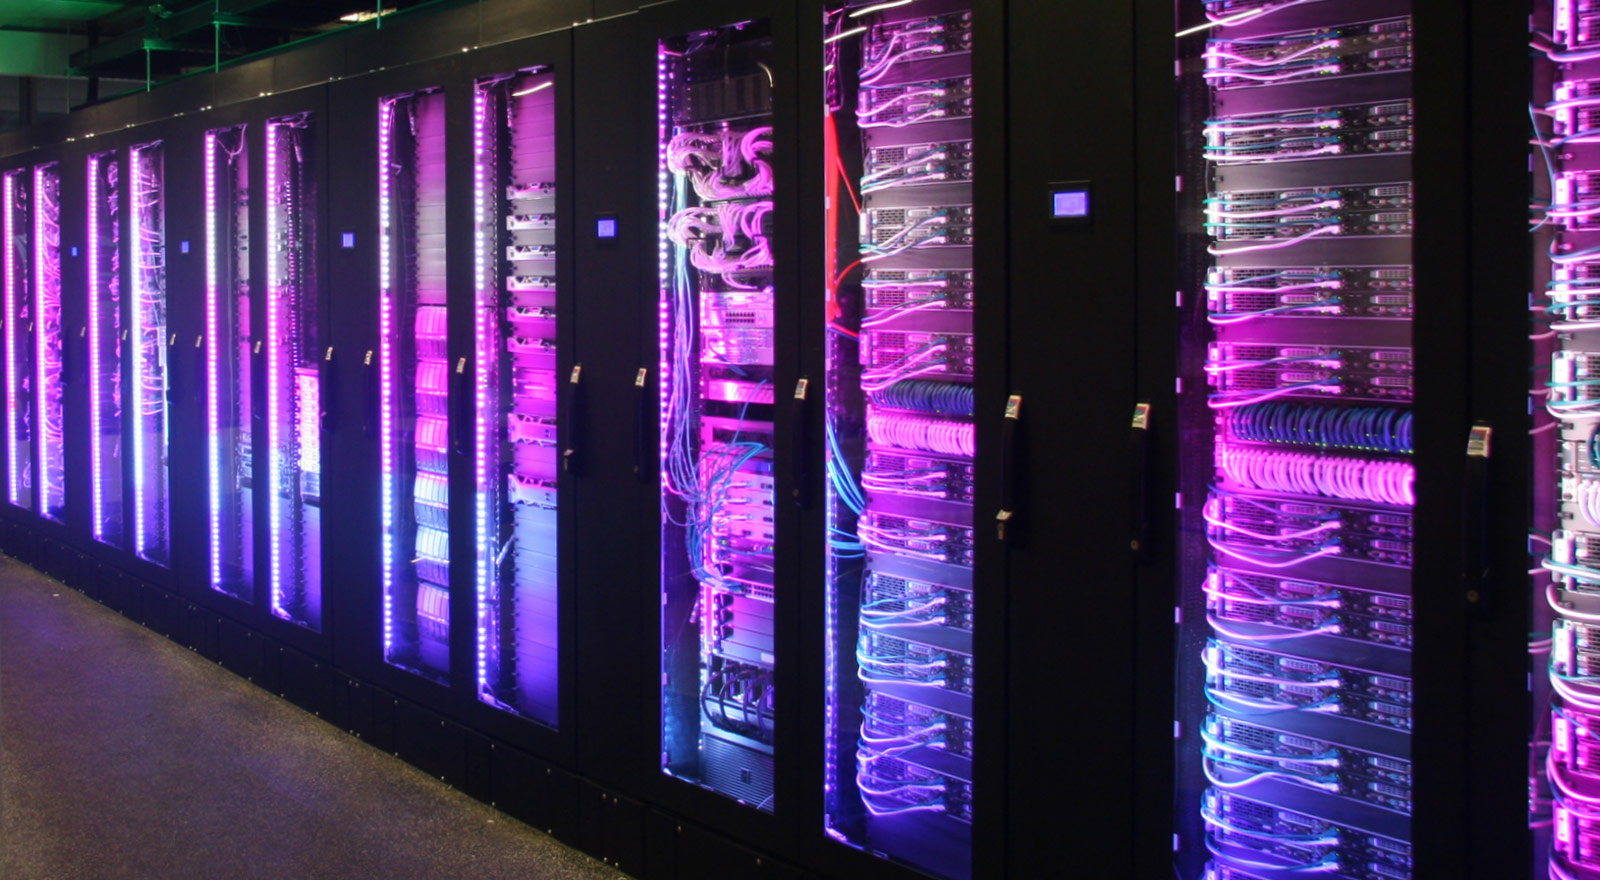 yếu tố cần biết để đặt datacenter